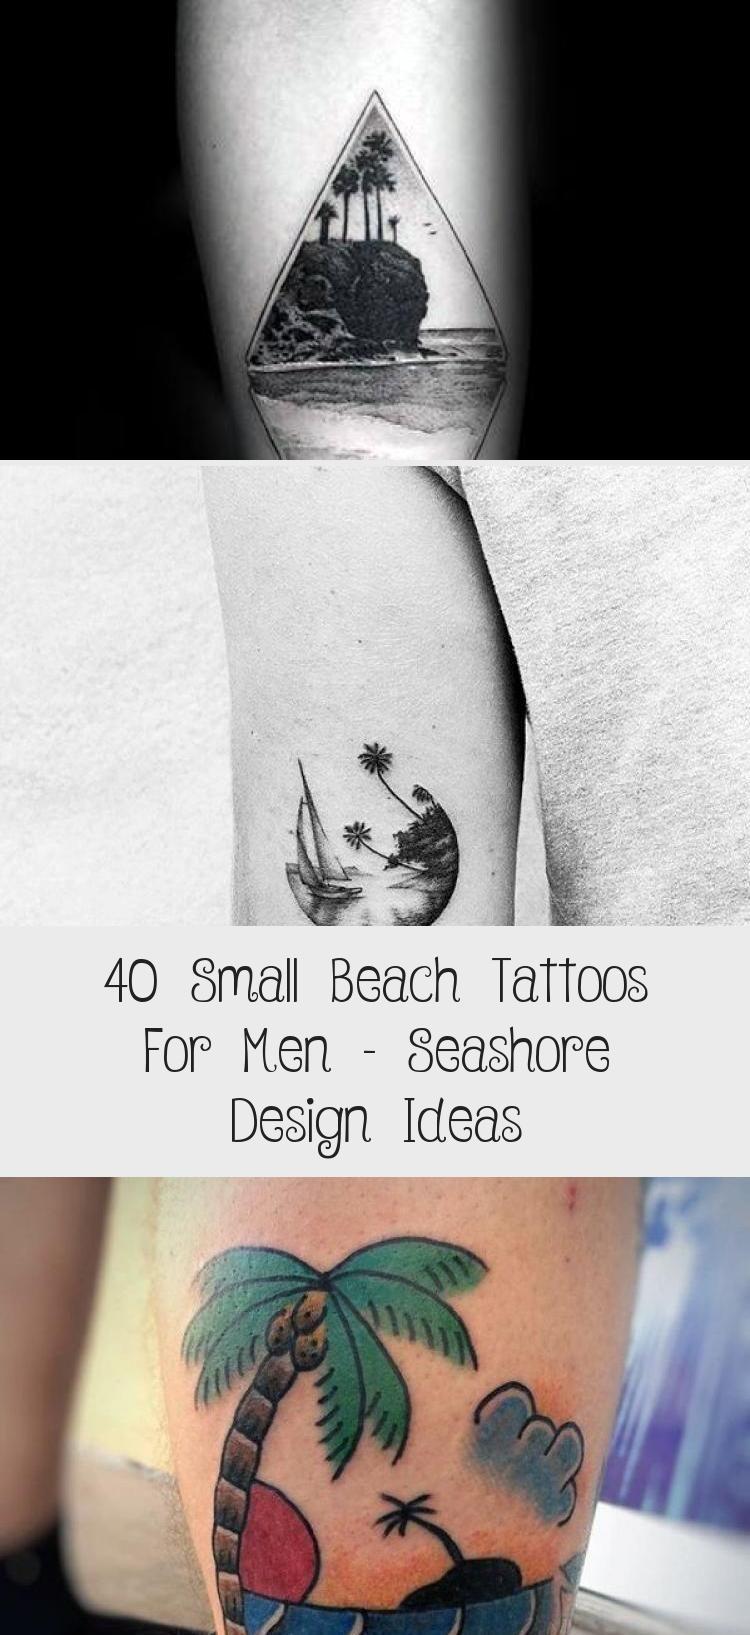 Photo of 40 Small Beach Tattoos For Men – Seashore Design Ideas – Tattoo İdeas